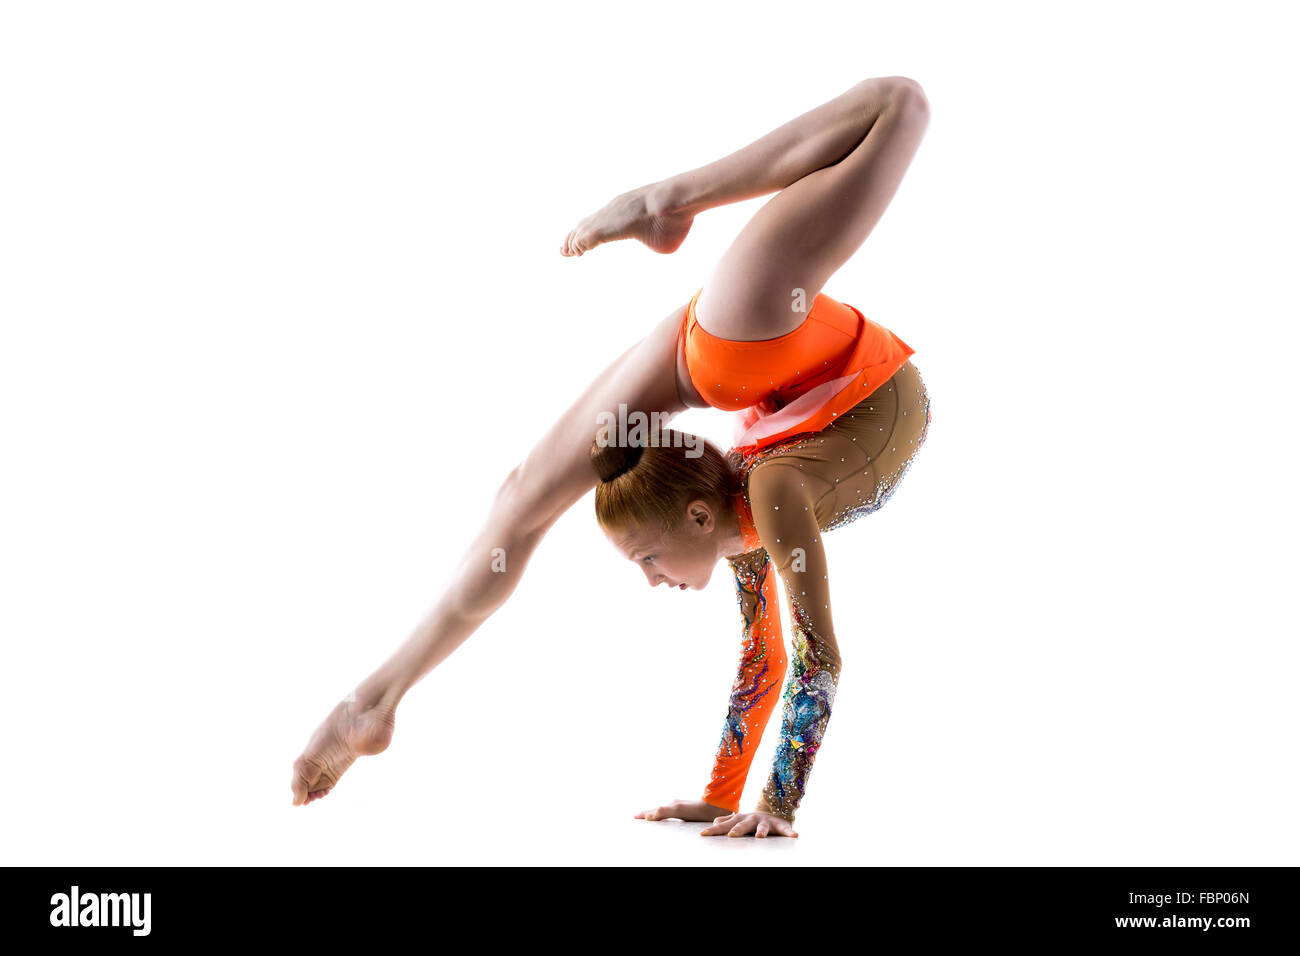 Beautiful gymnast athlete teenage girl wearing dancer colorful leotard working out, dancing, doing backbend, handstand - Stock Image